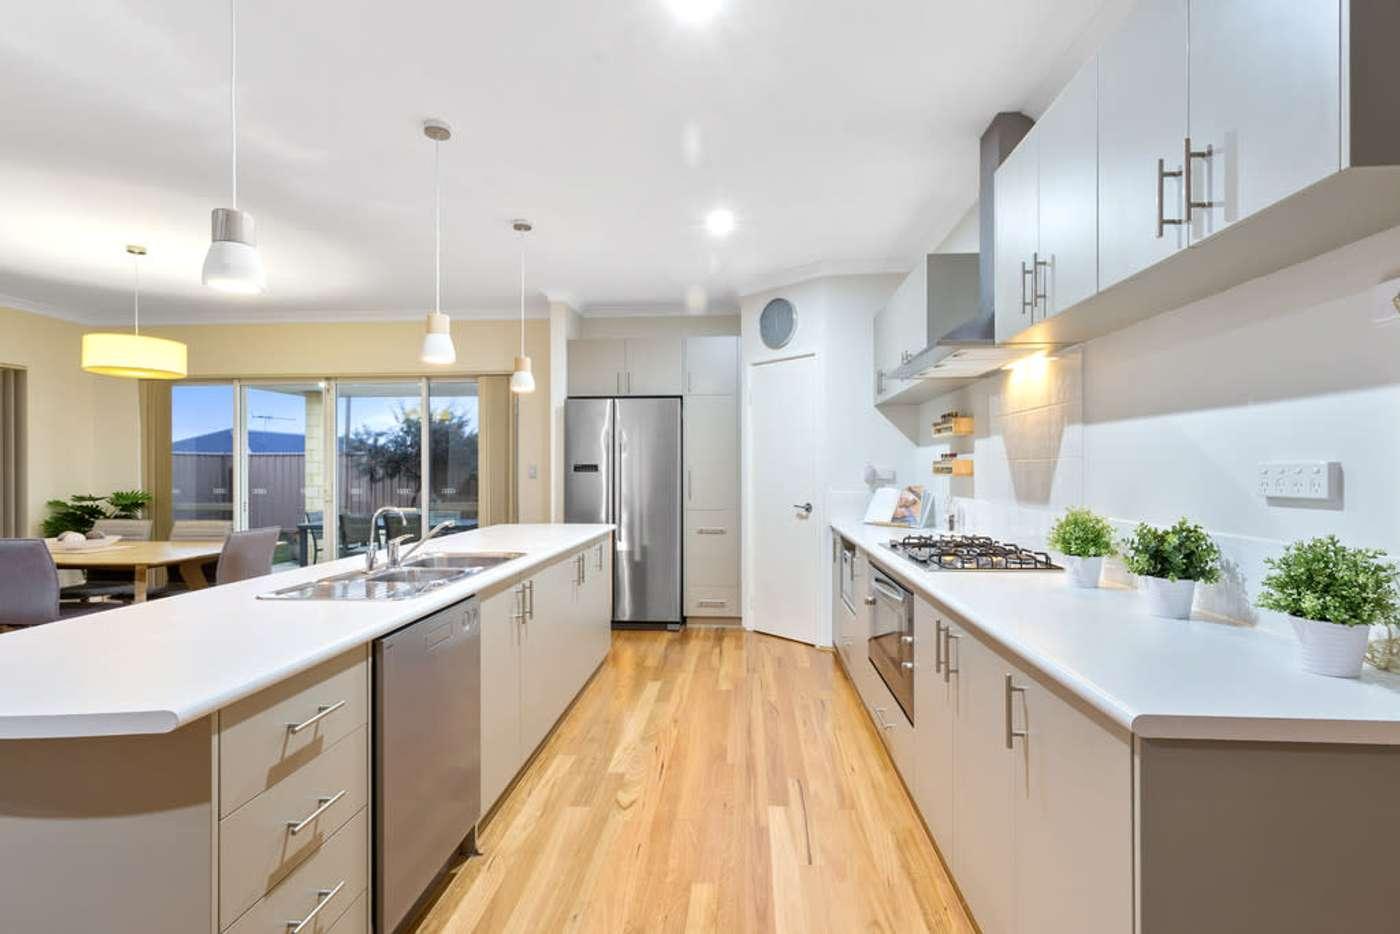 Sixth view of Homely house listing, 58 Peregrine Circle, Beeliar WA 6164